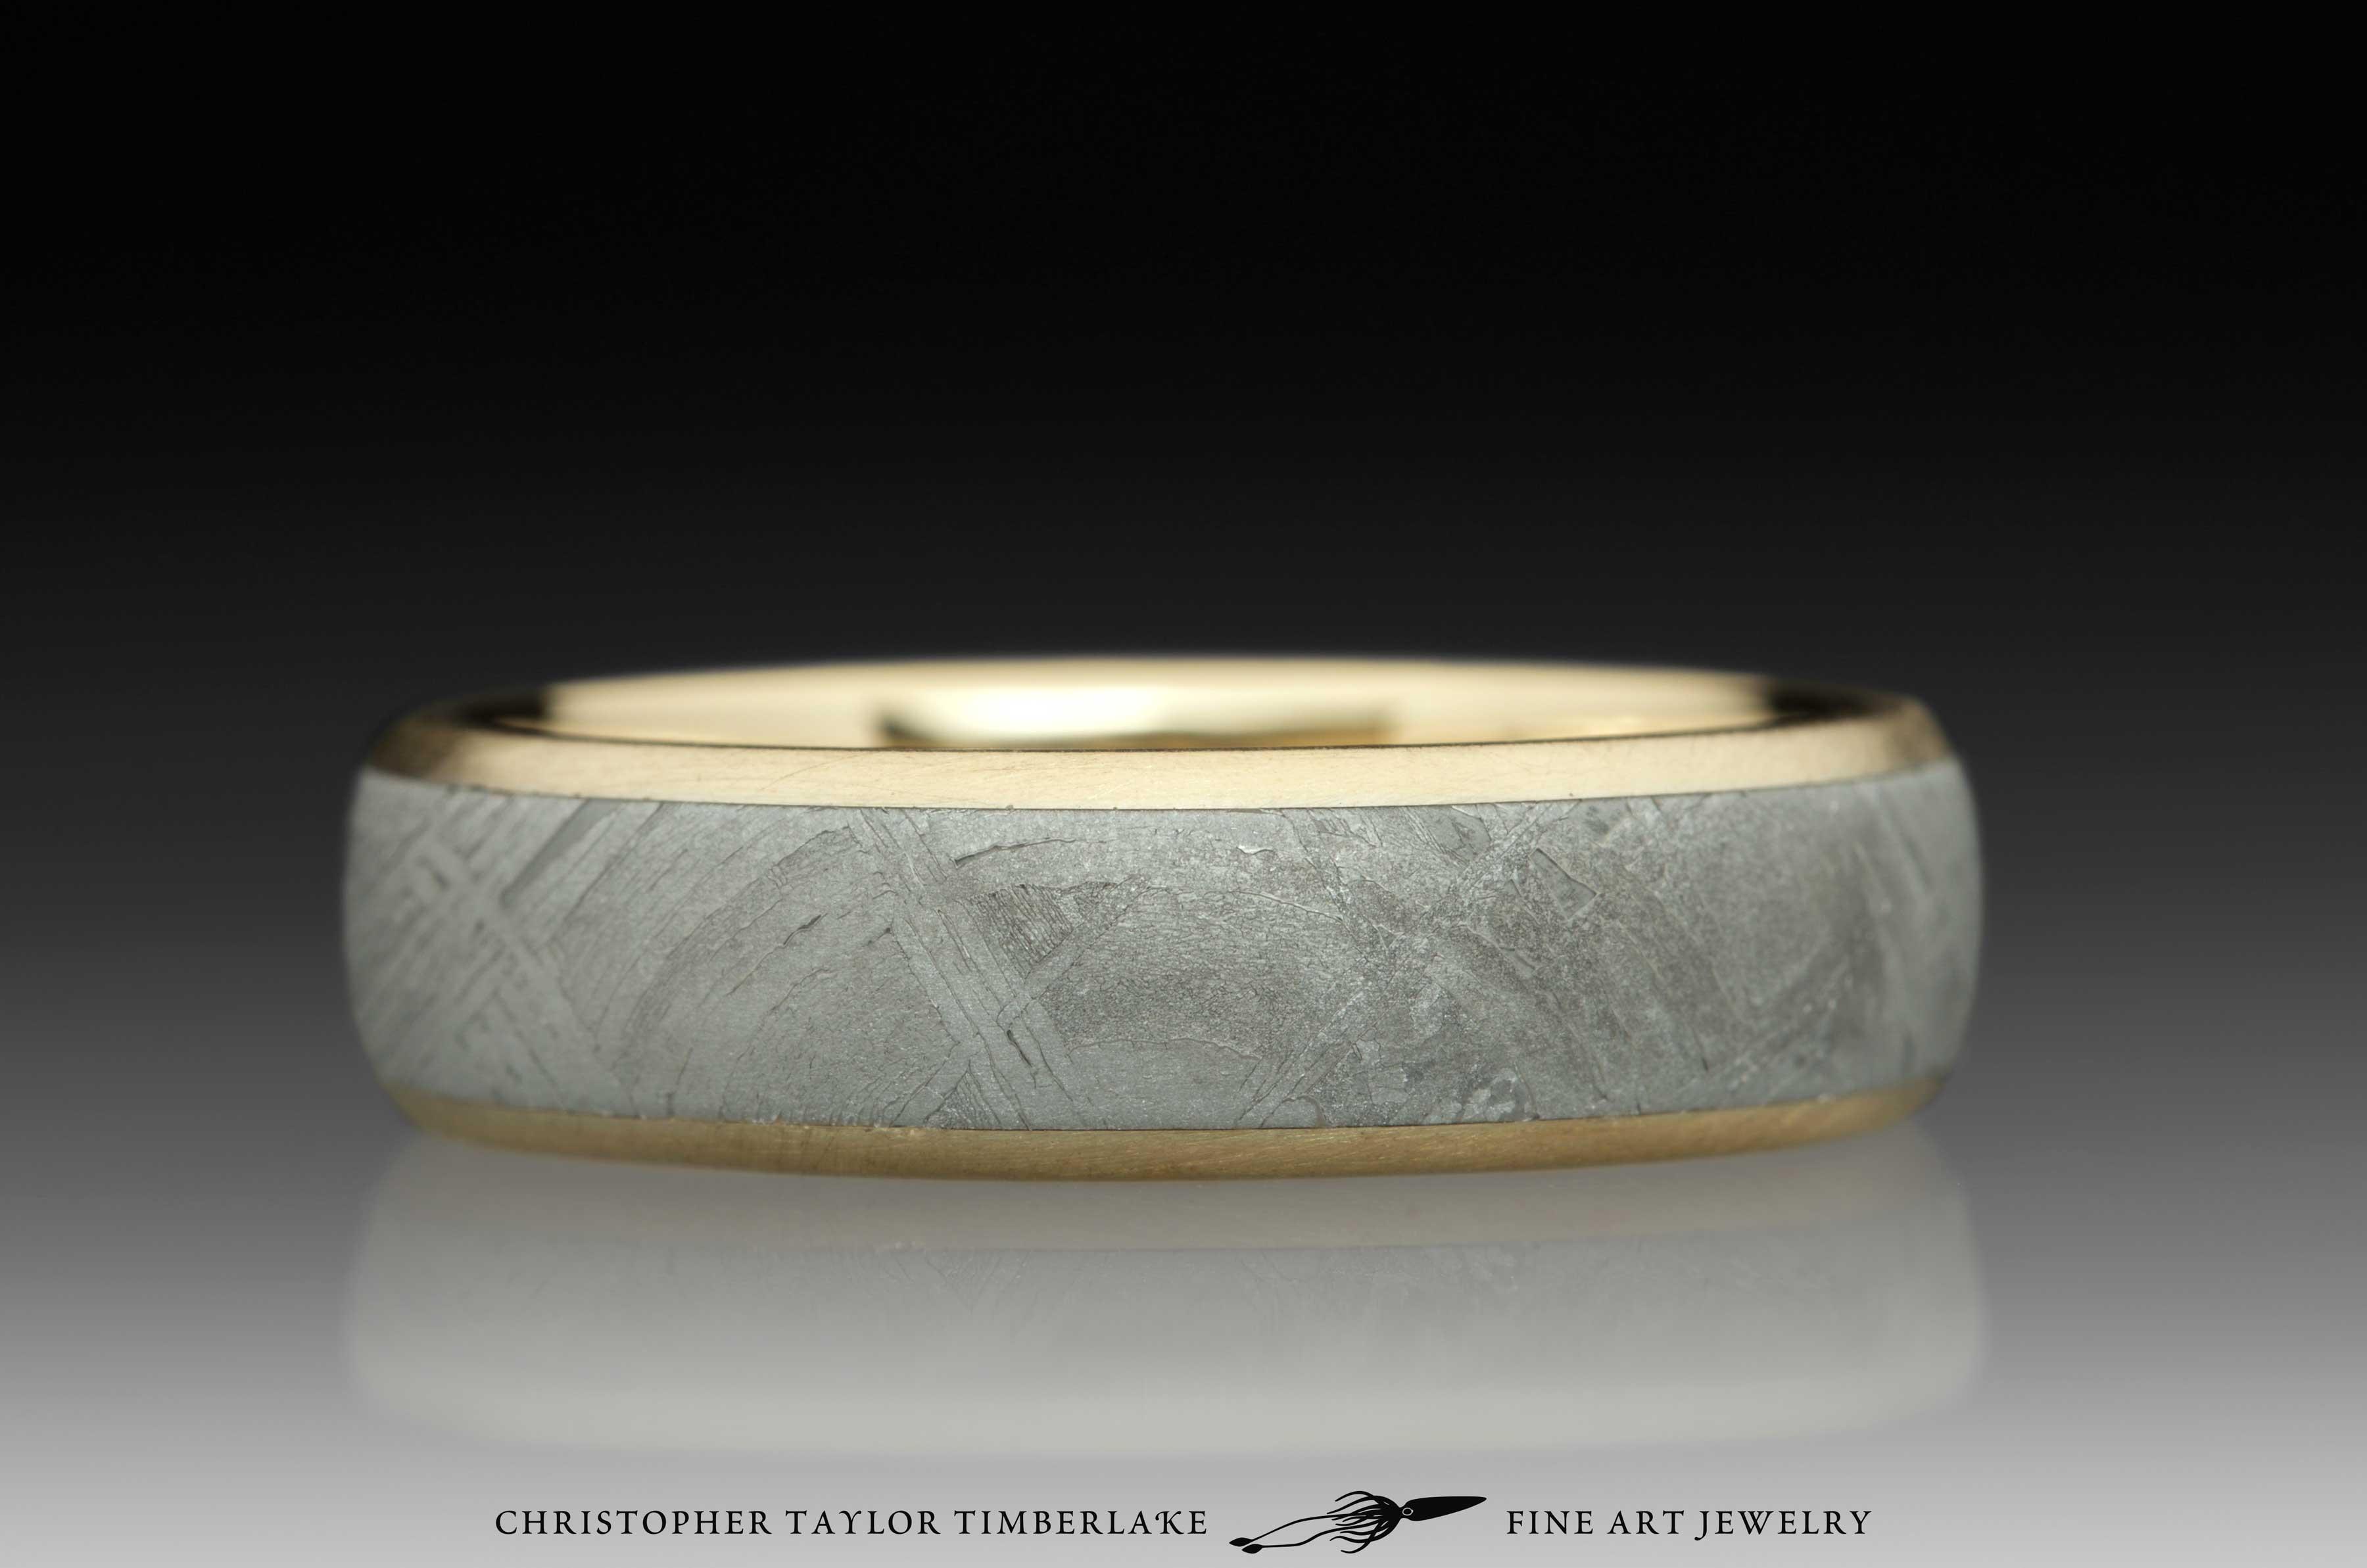 Meteorite-14K-karat-yellow-gold-ring,-domed,-etched,-(.75-4.5-.75)-6mm,-14K-yellow-gold-rims-4